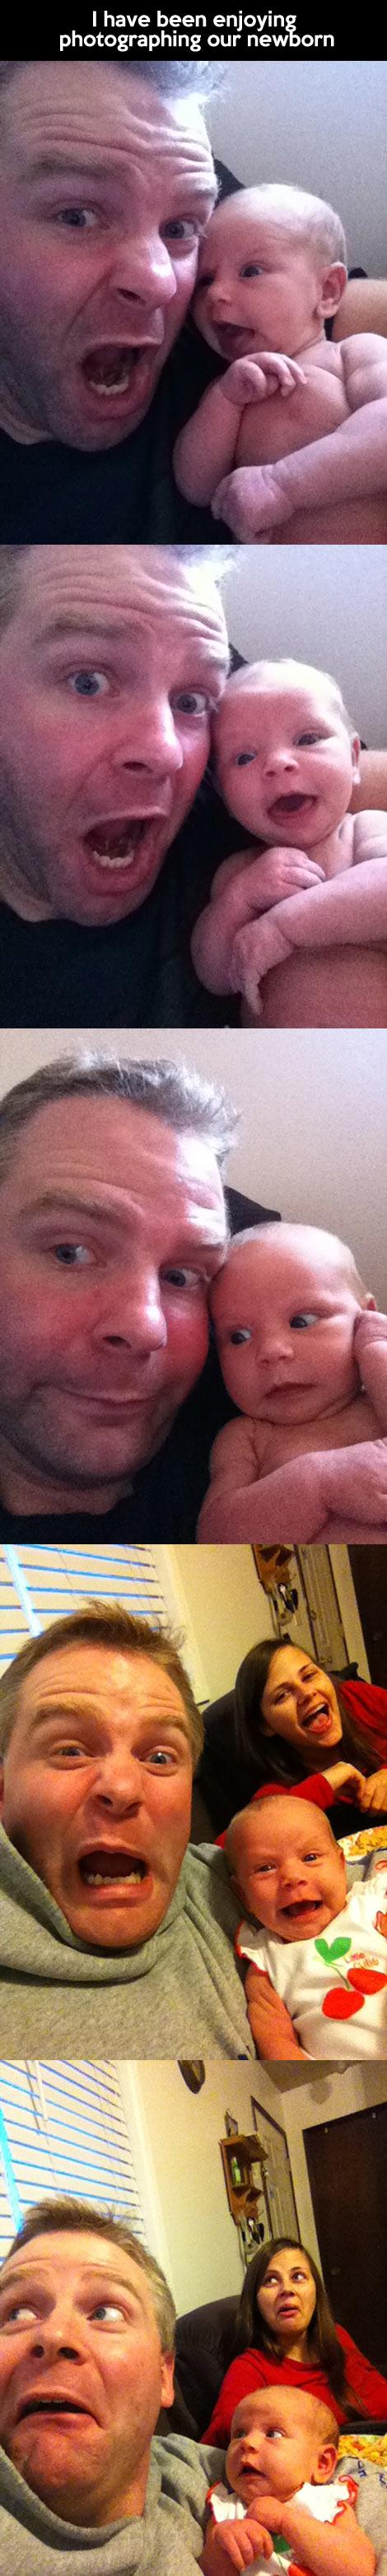 funny-dad-newborn-photo-faces